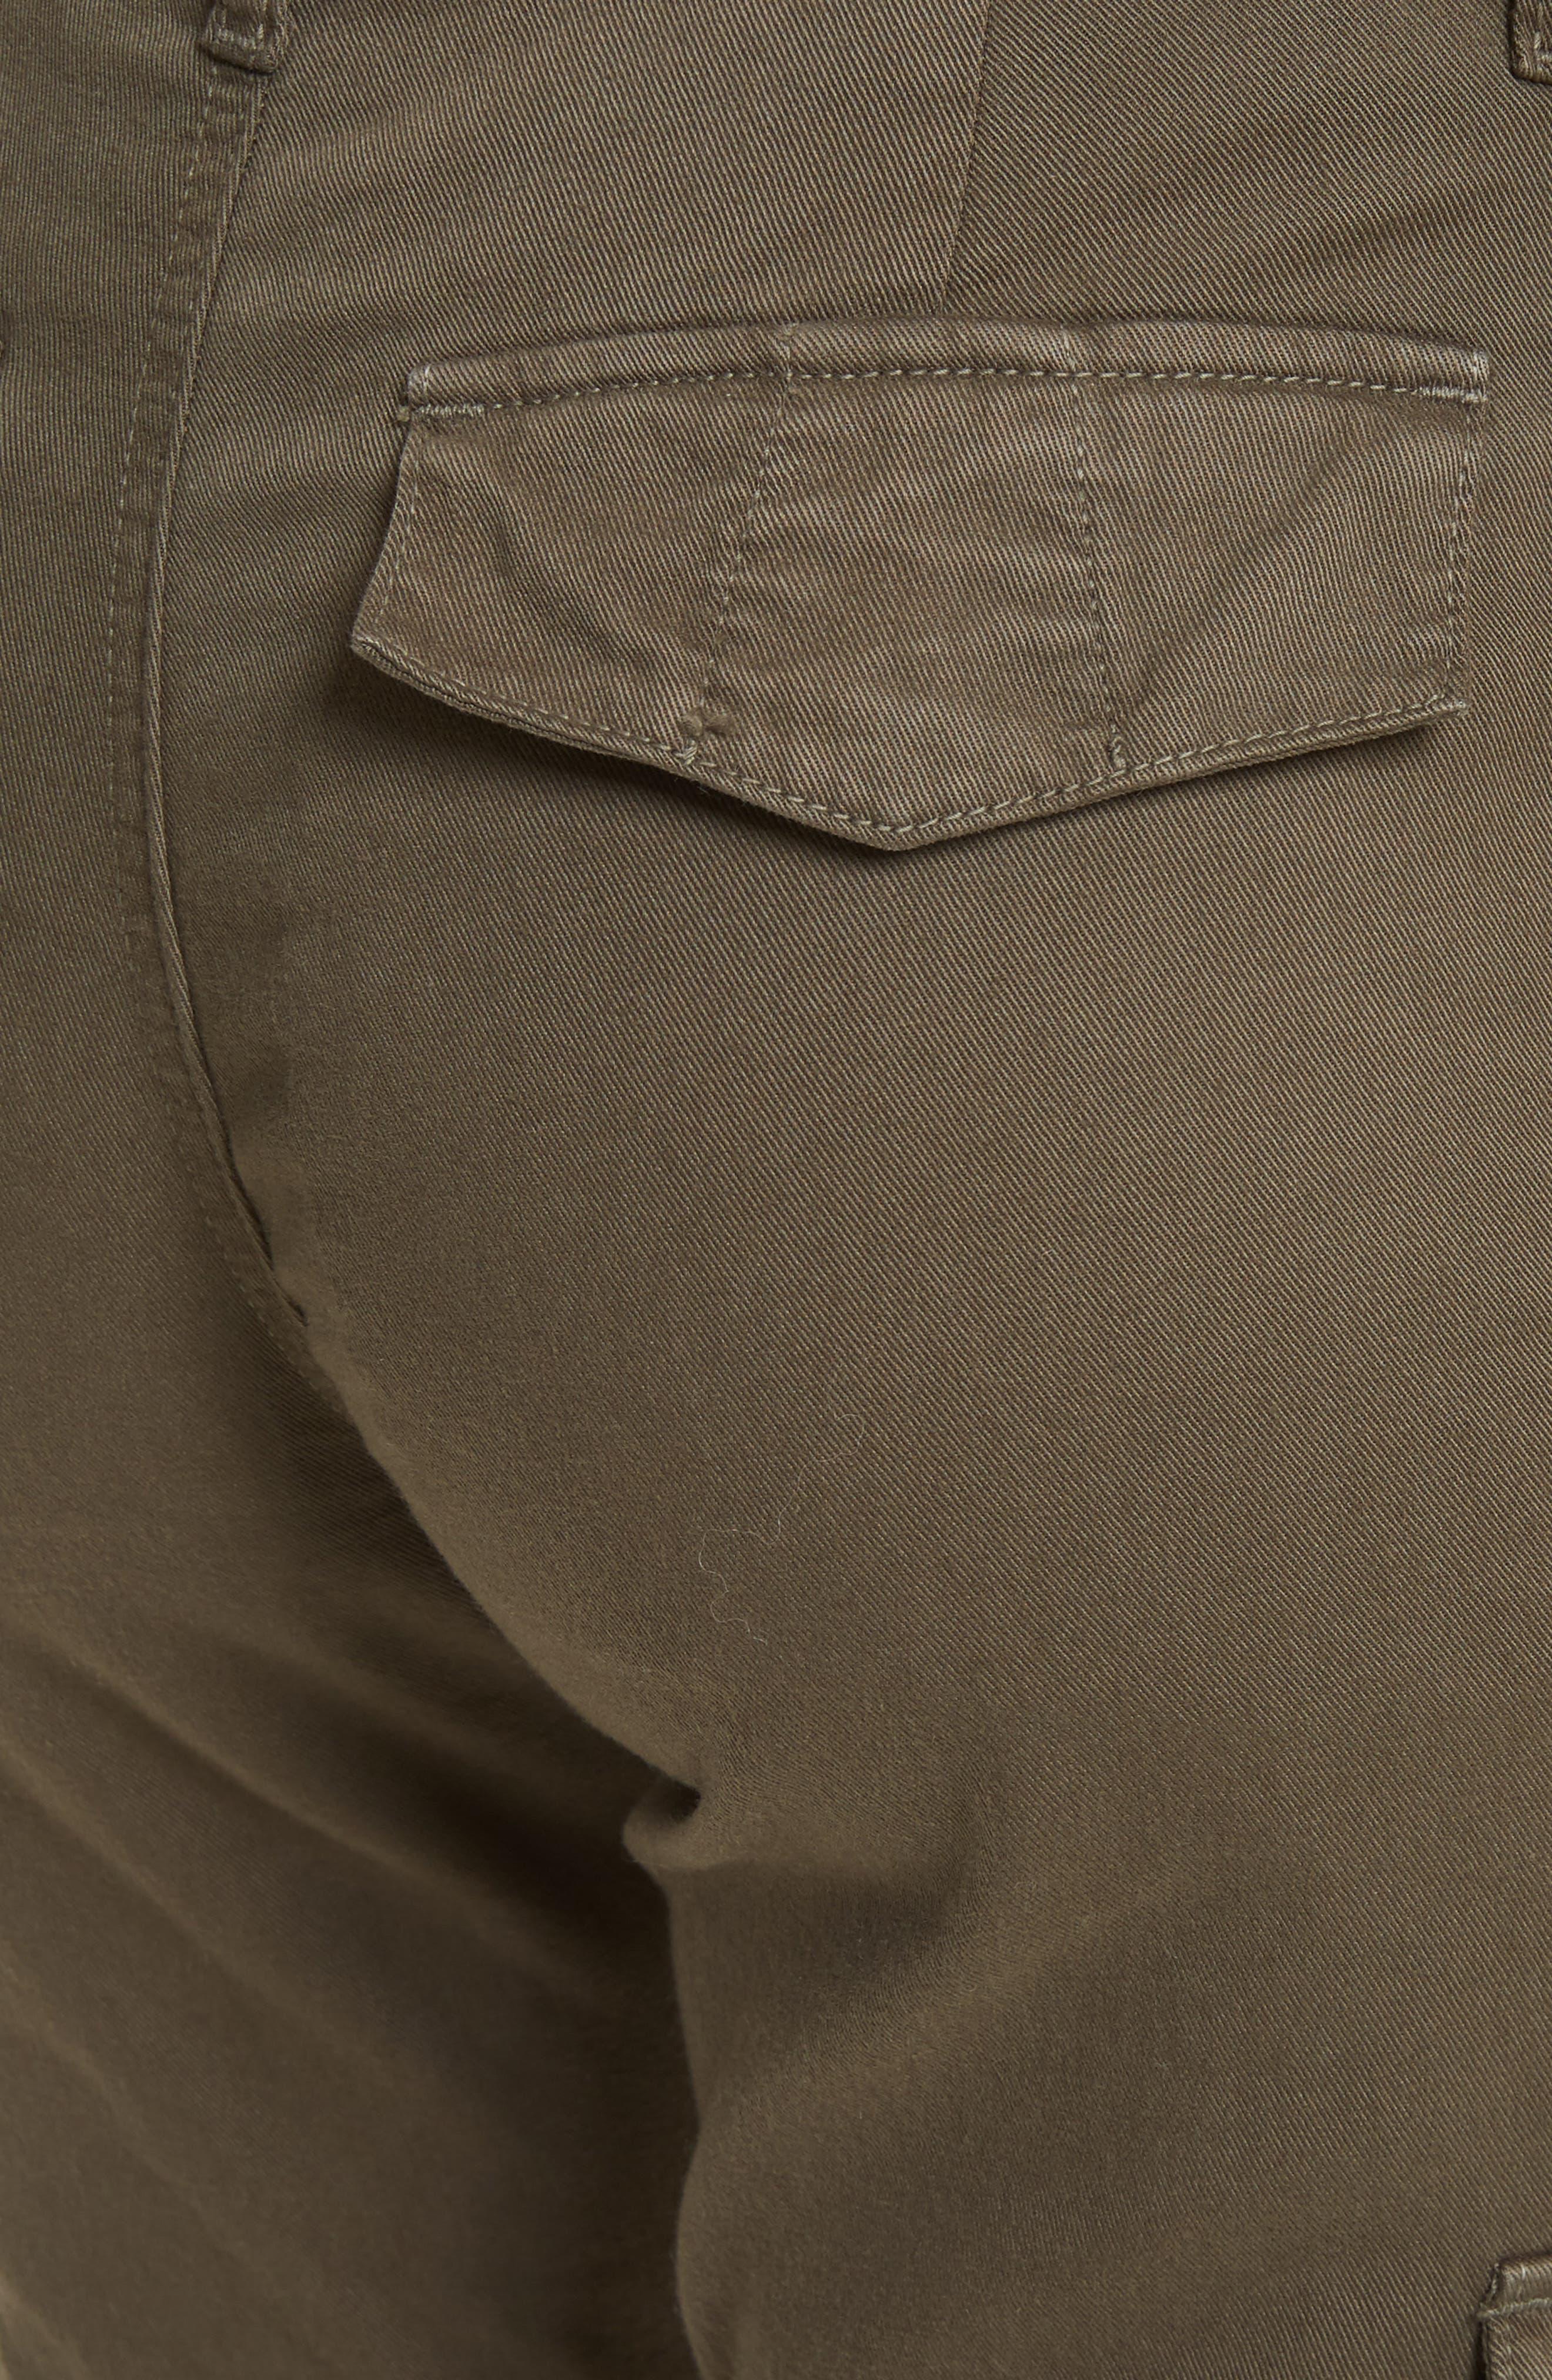 Embellished Cargo Pants,                             Alternate thumbnail 5, color,